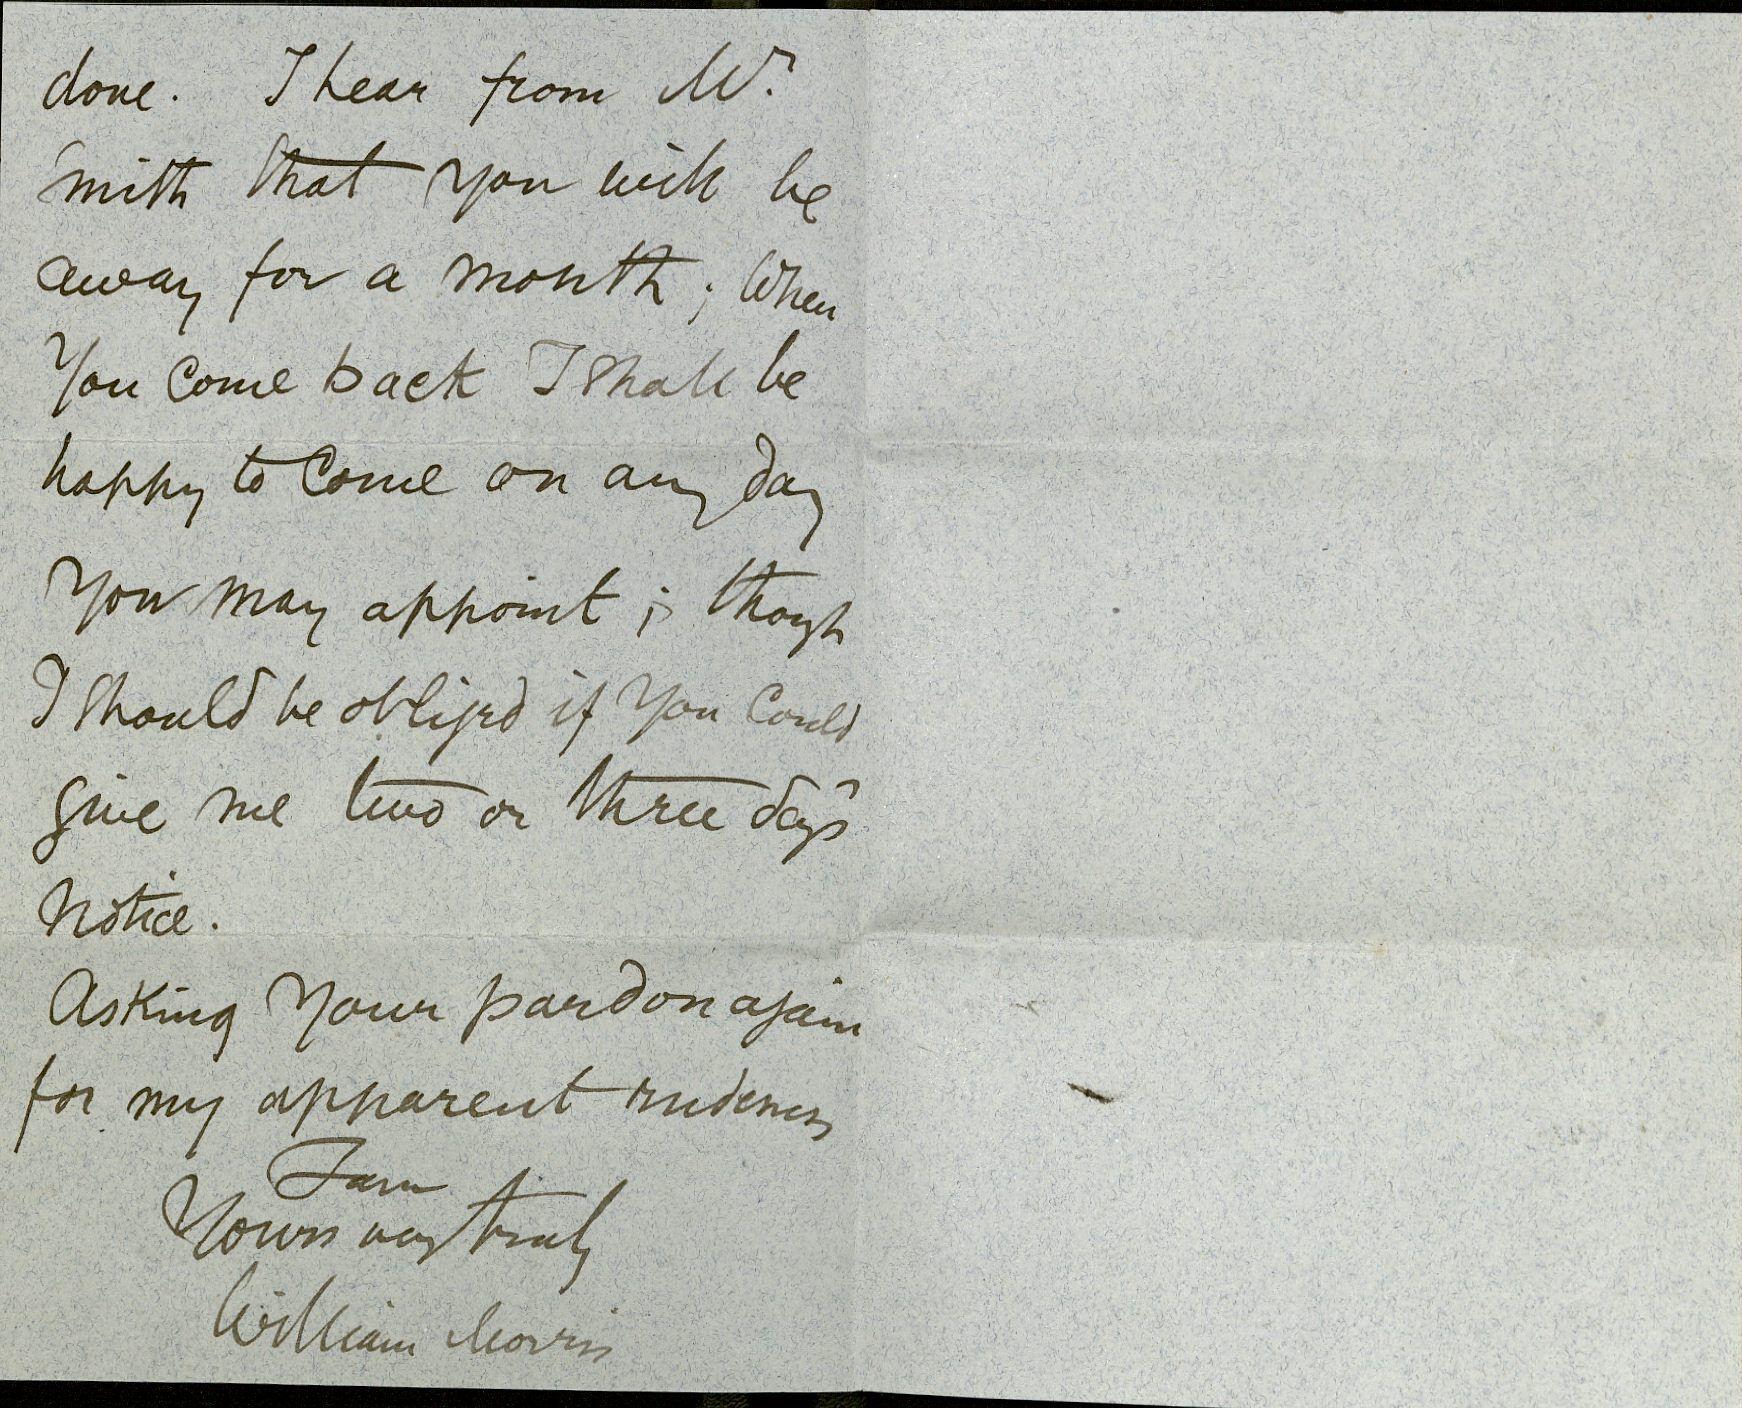 William Morris, ALS to Laurence Hodson, August 2, 1894.